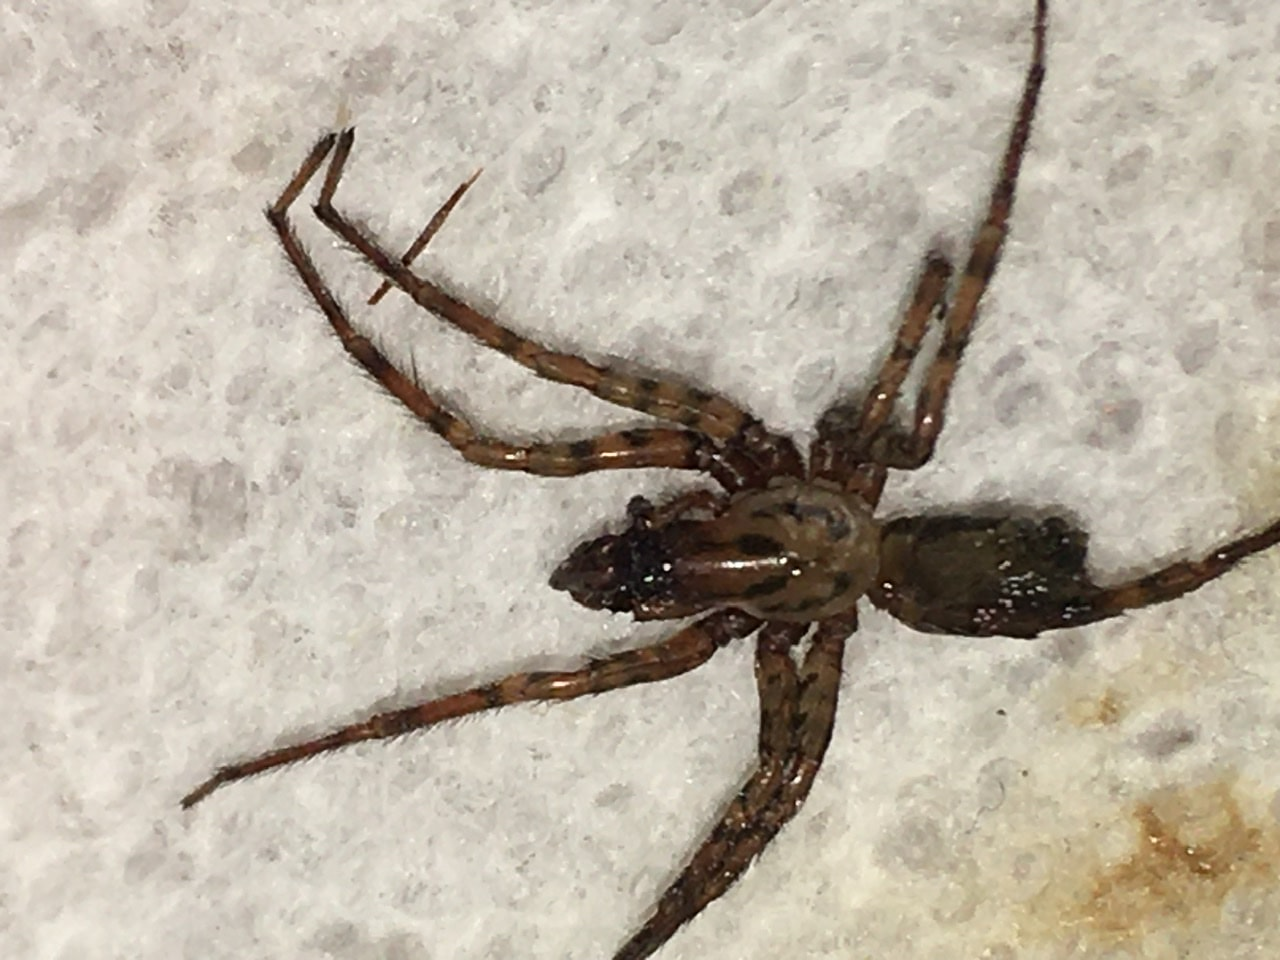 Picture of Coras (Funnel Web Spiders) - Male - Dorsal